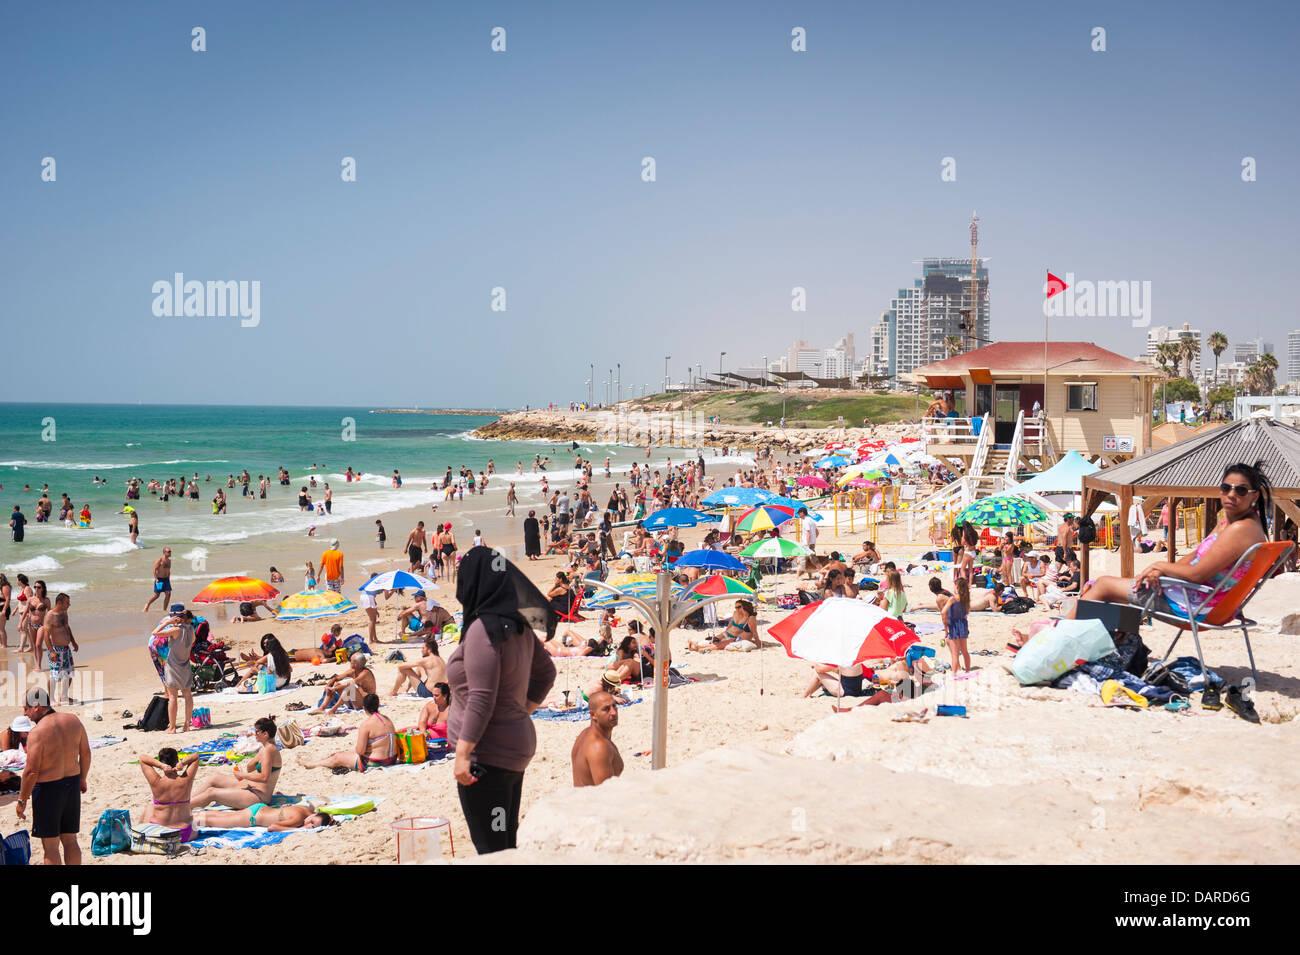 Israel Tel Aviv Jaffa Yafo Manta Ray Beach crowds under parasols umbrellas sonnenschirm sand sea sunbathers sunbathers - Stock Image